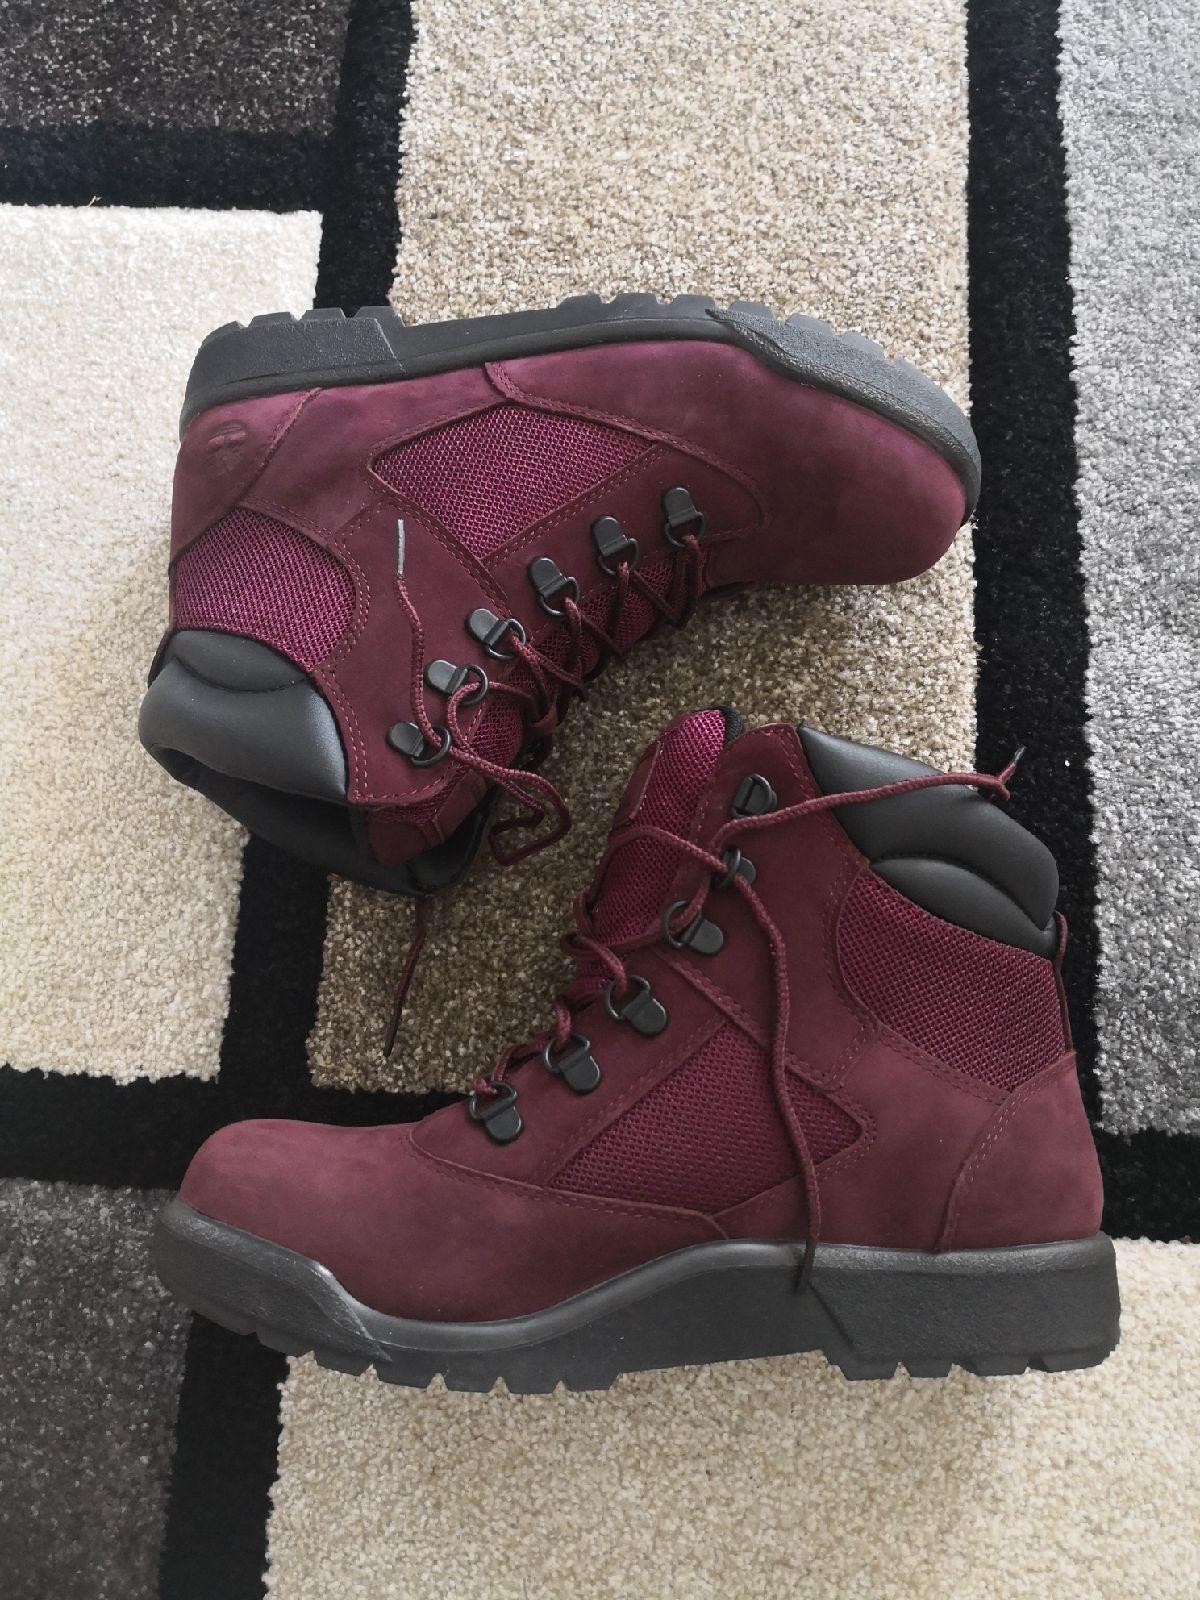 New Timberland boots juniors or women